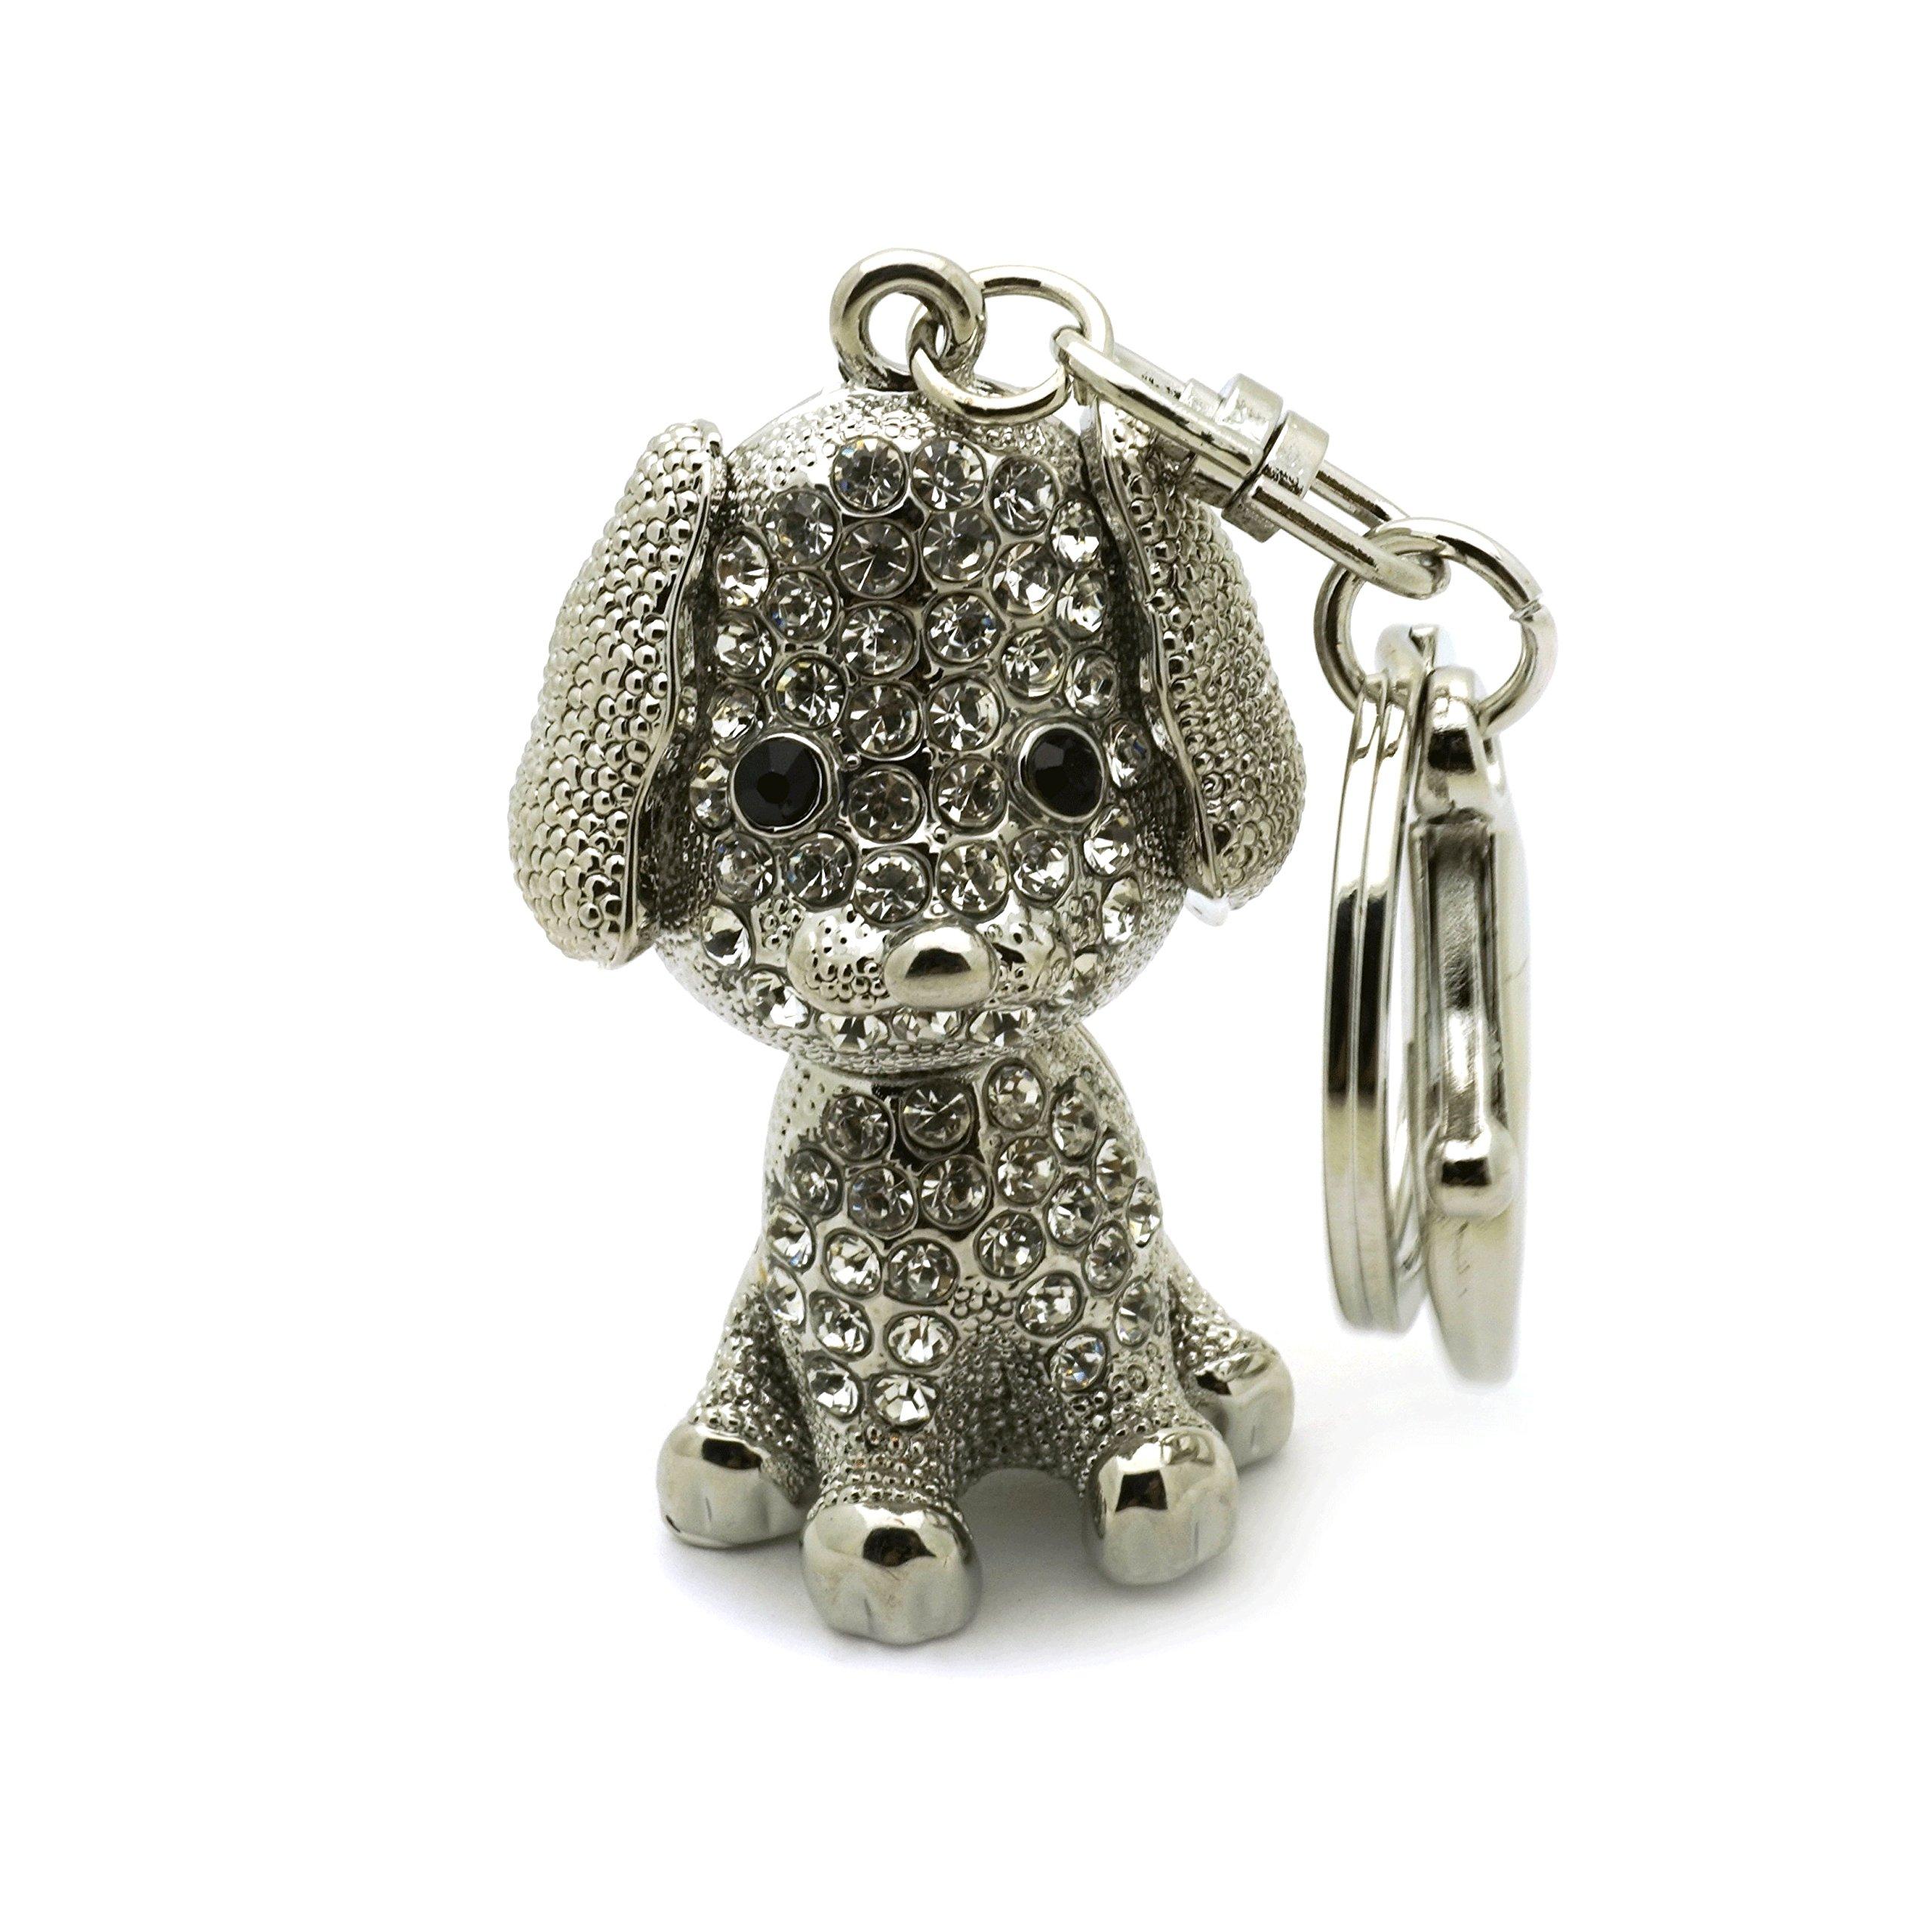 Teri's Boutique Dog Puppy Lover Great Gift Rhinestone 3D Women Kids Charm Keychain (Silver)